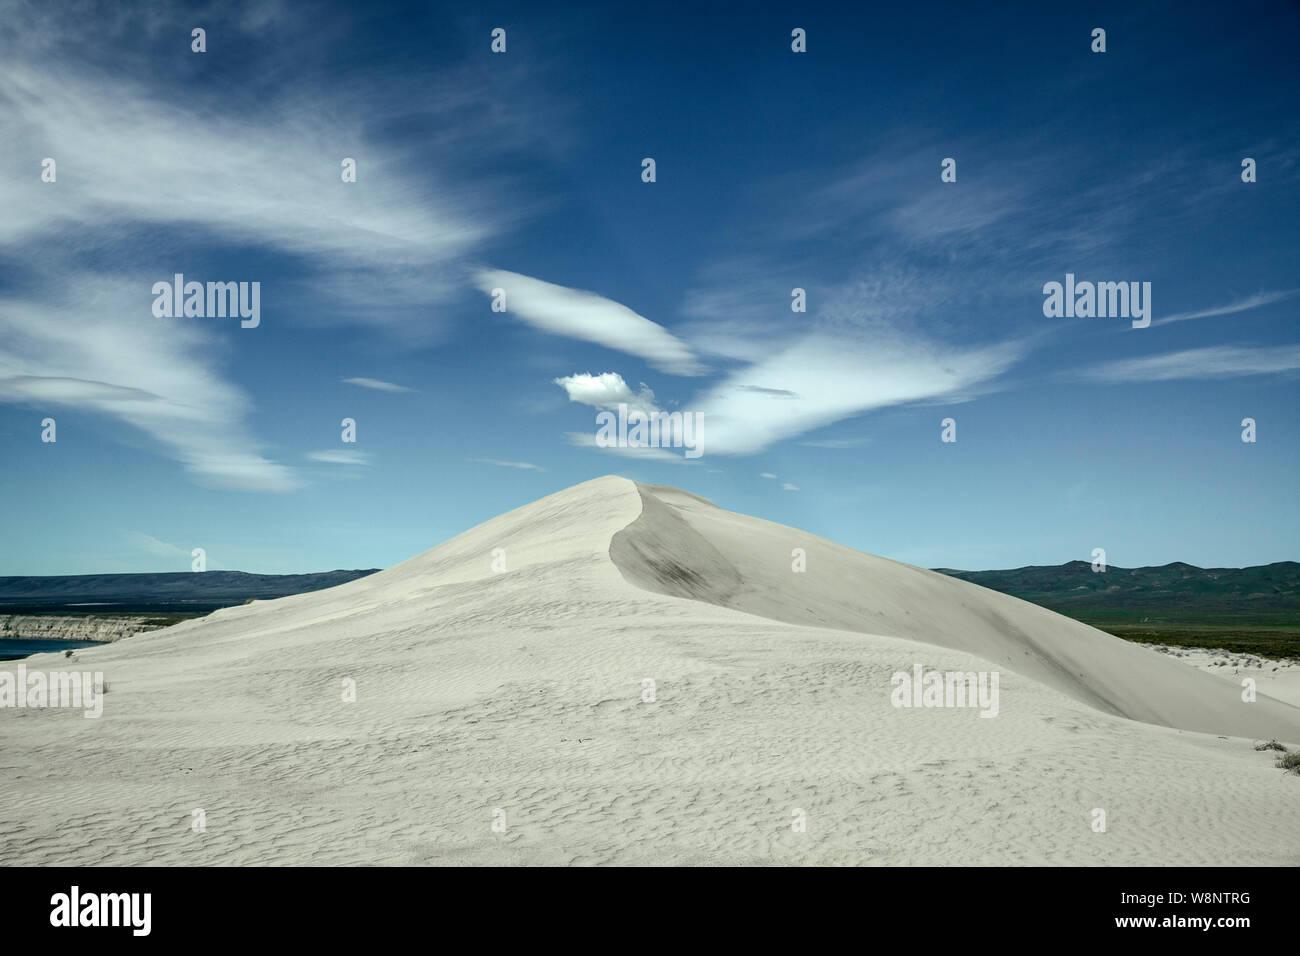 WA17206-00...WASHINGTON - Sand dune in the Hanford Reach National Monument. Stock Photo